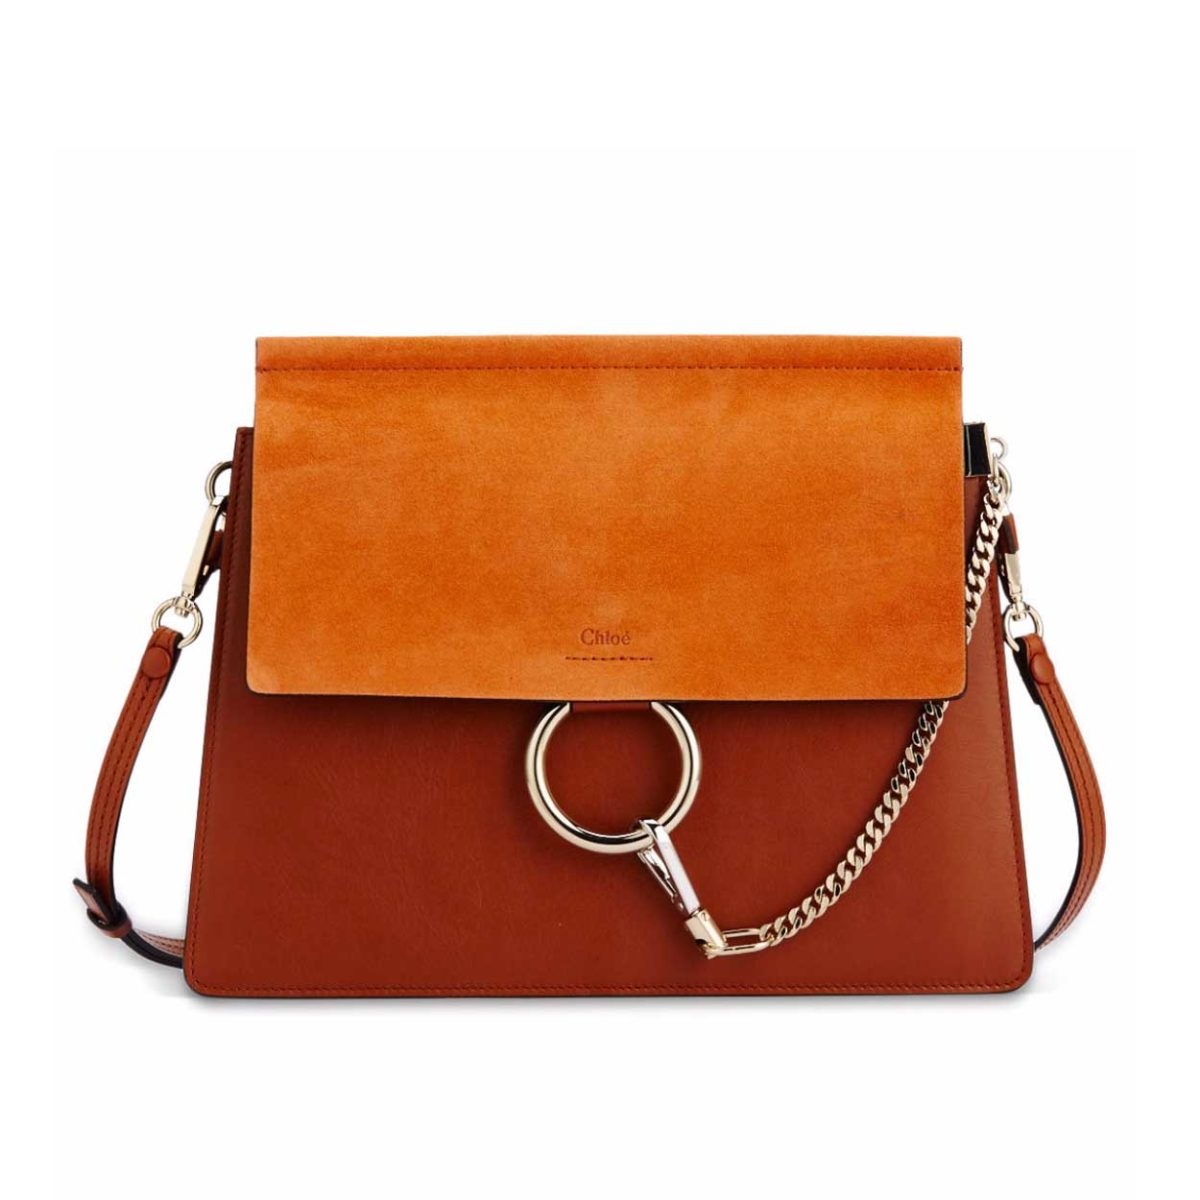 d472f0f805 CHLOE Suede   Leather Faye Shoulder Bag Medium - NEW